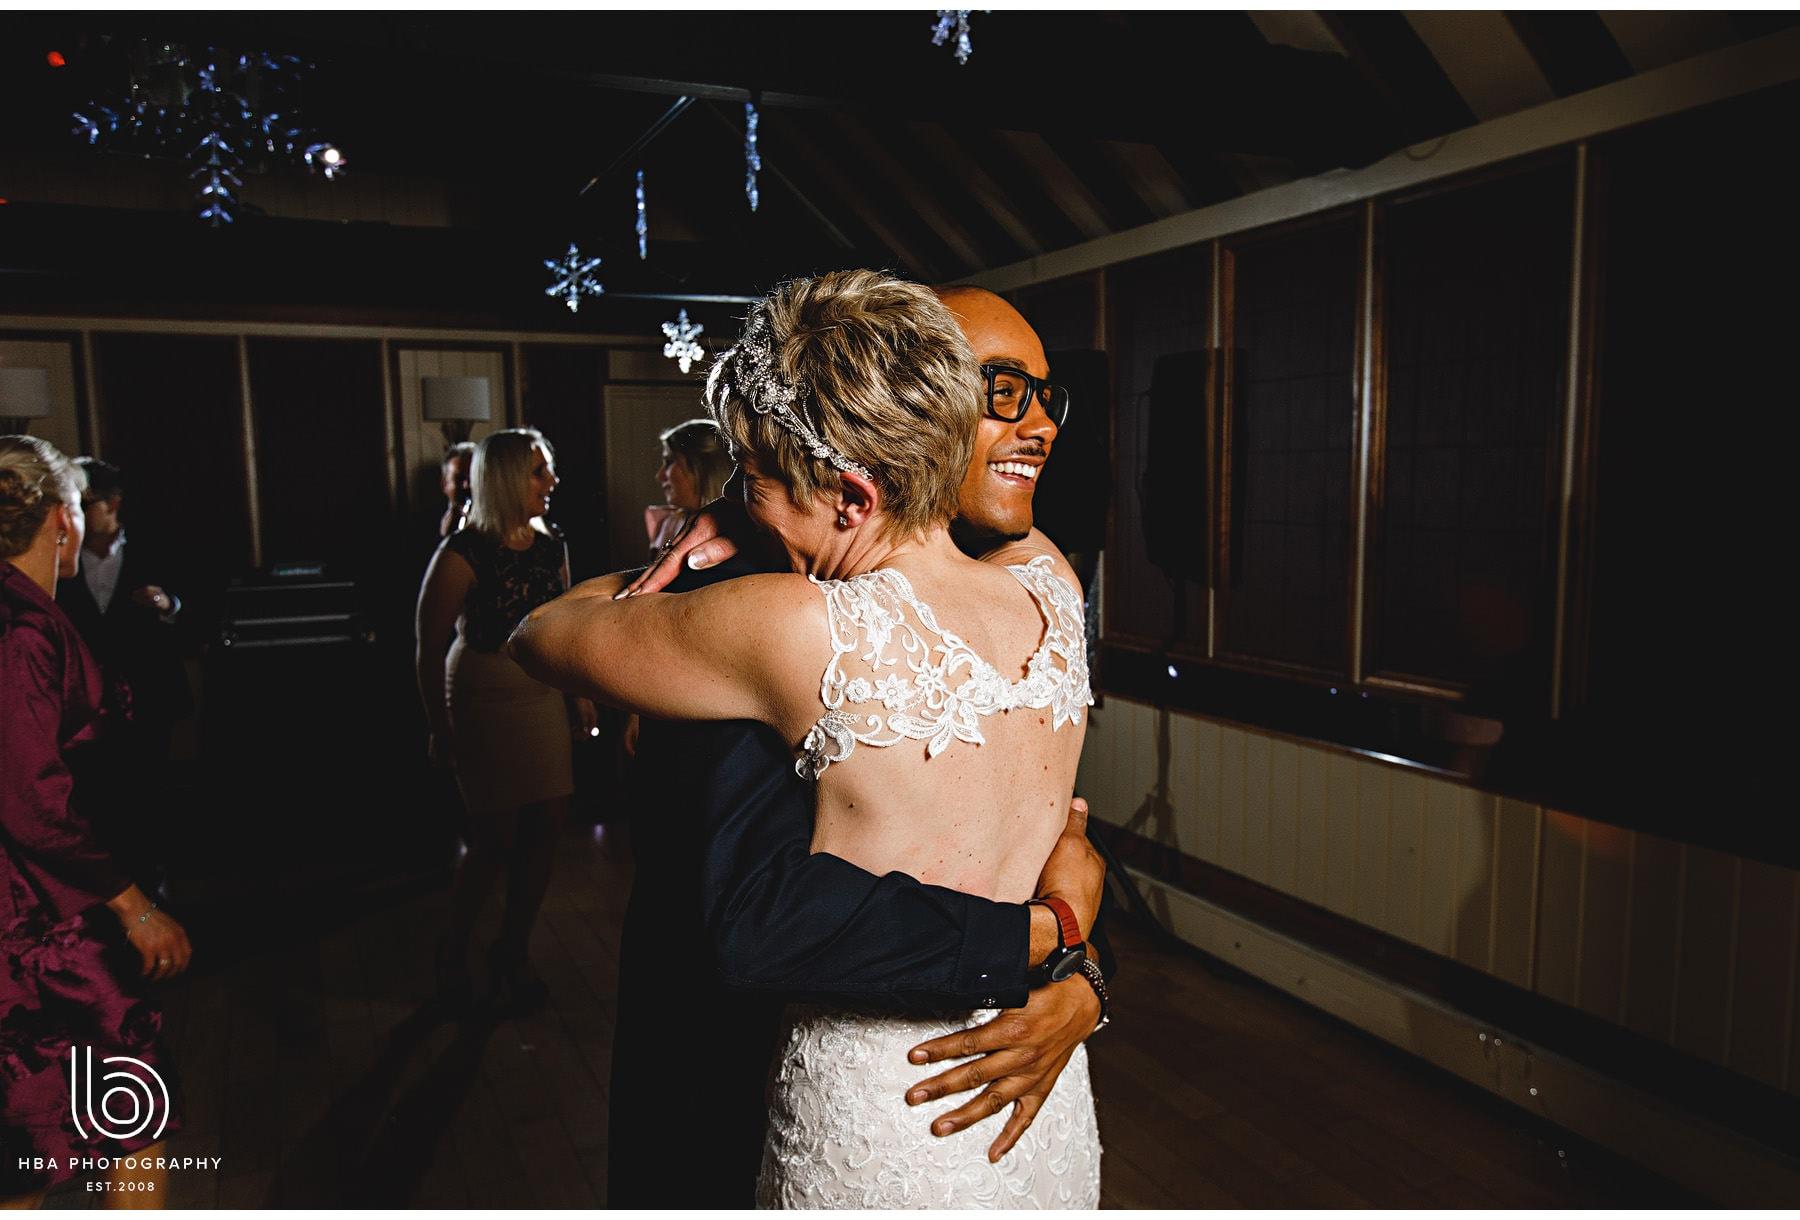 the bride hugging friends